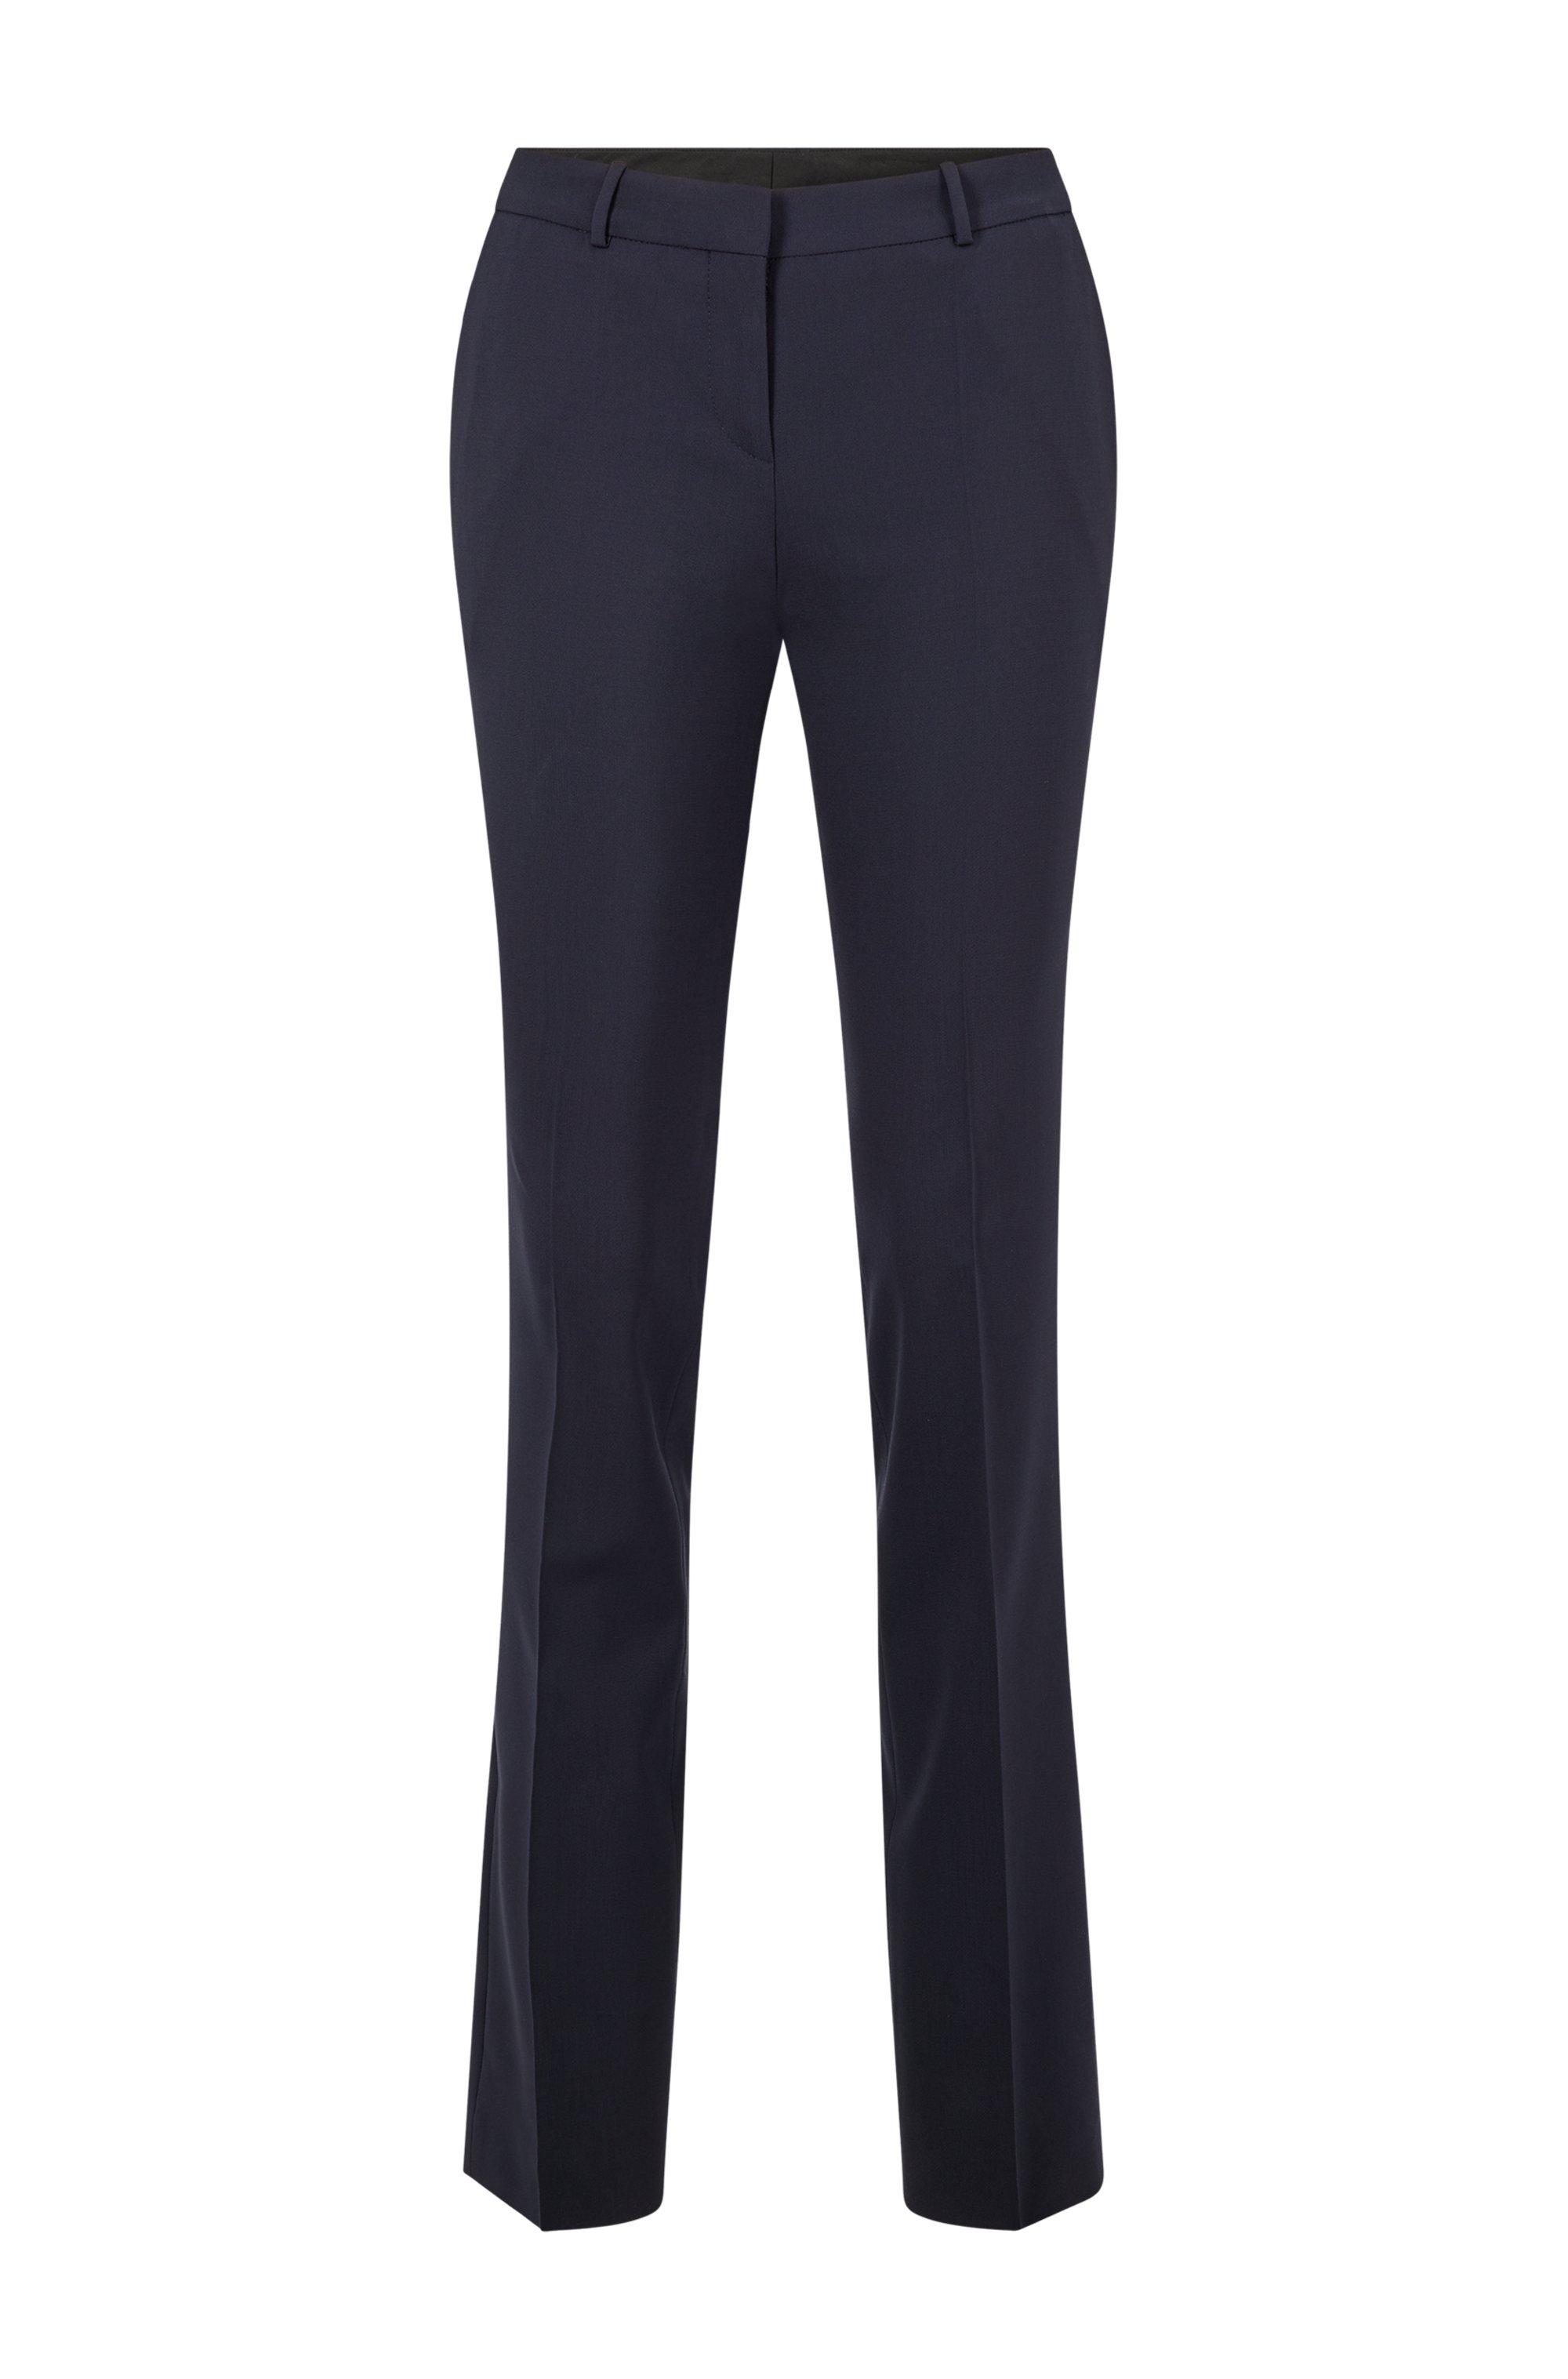 Pantalones regular fit en lana virgen elástica italiana, Azul oscuro